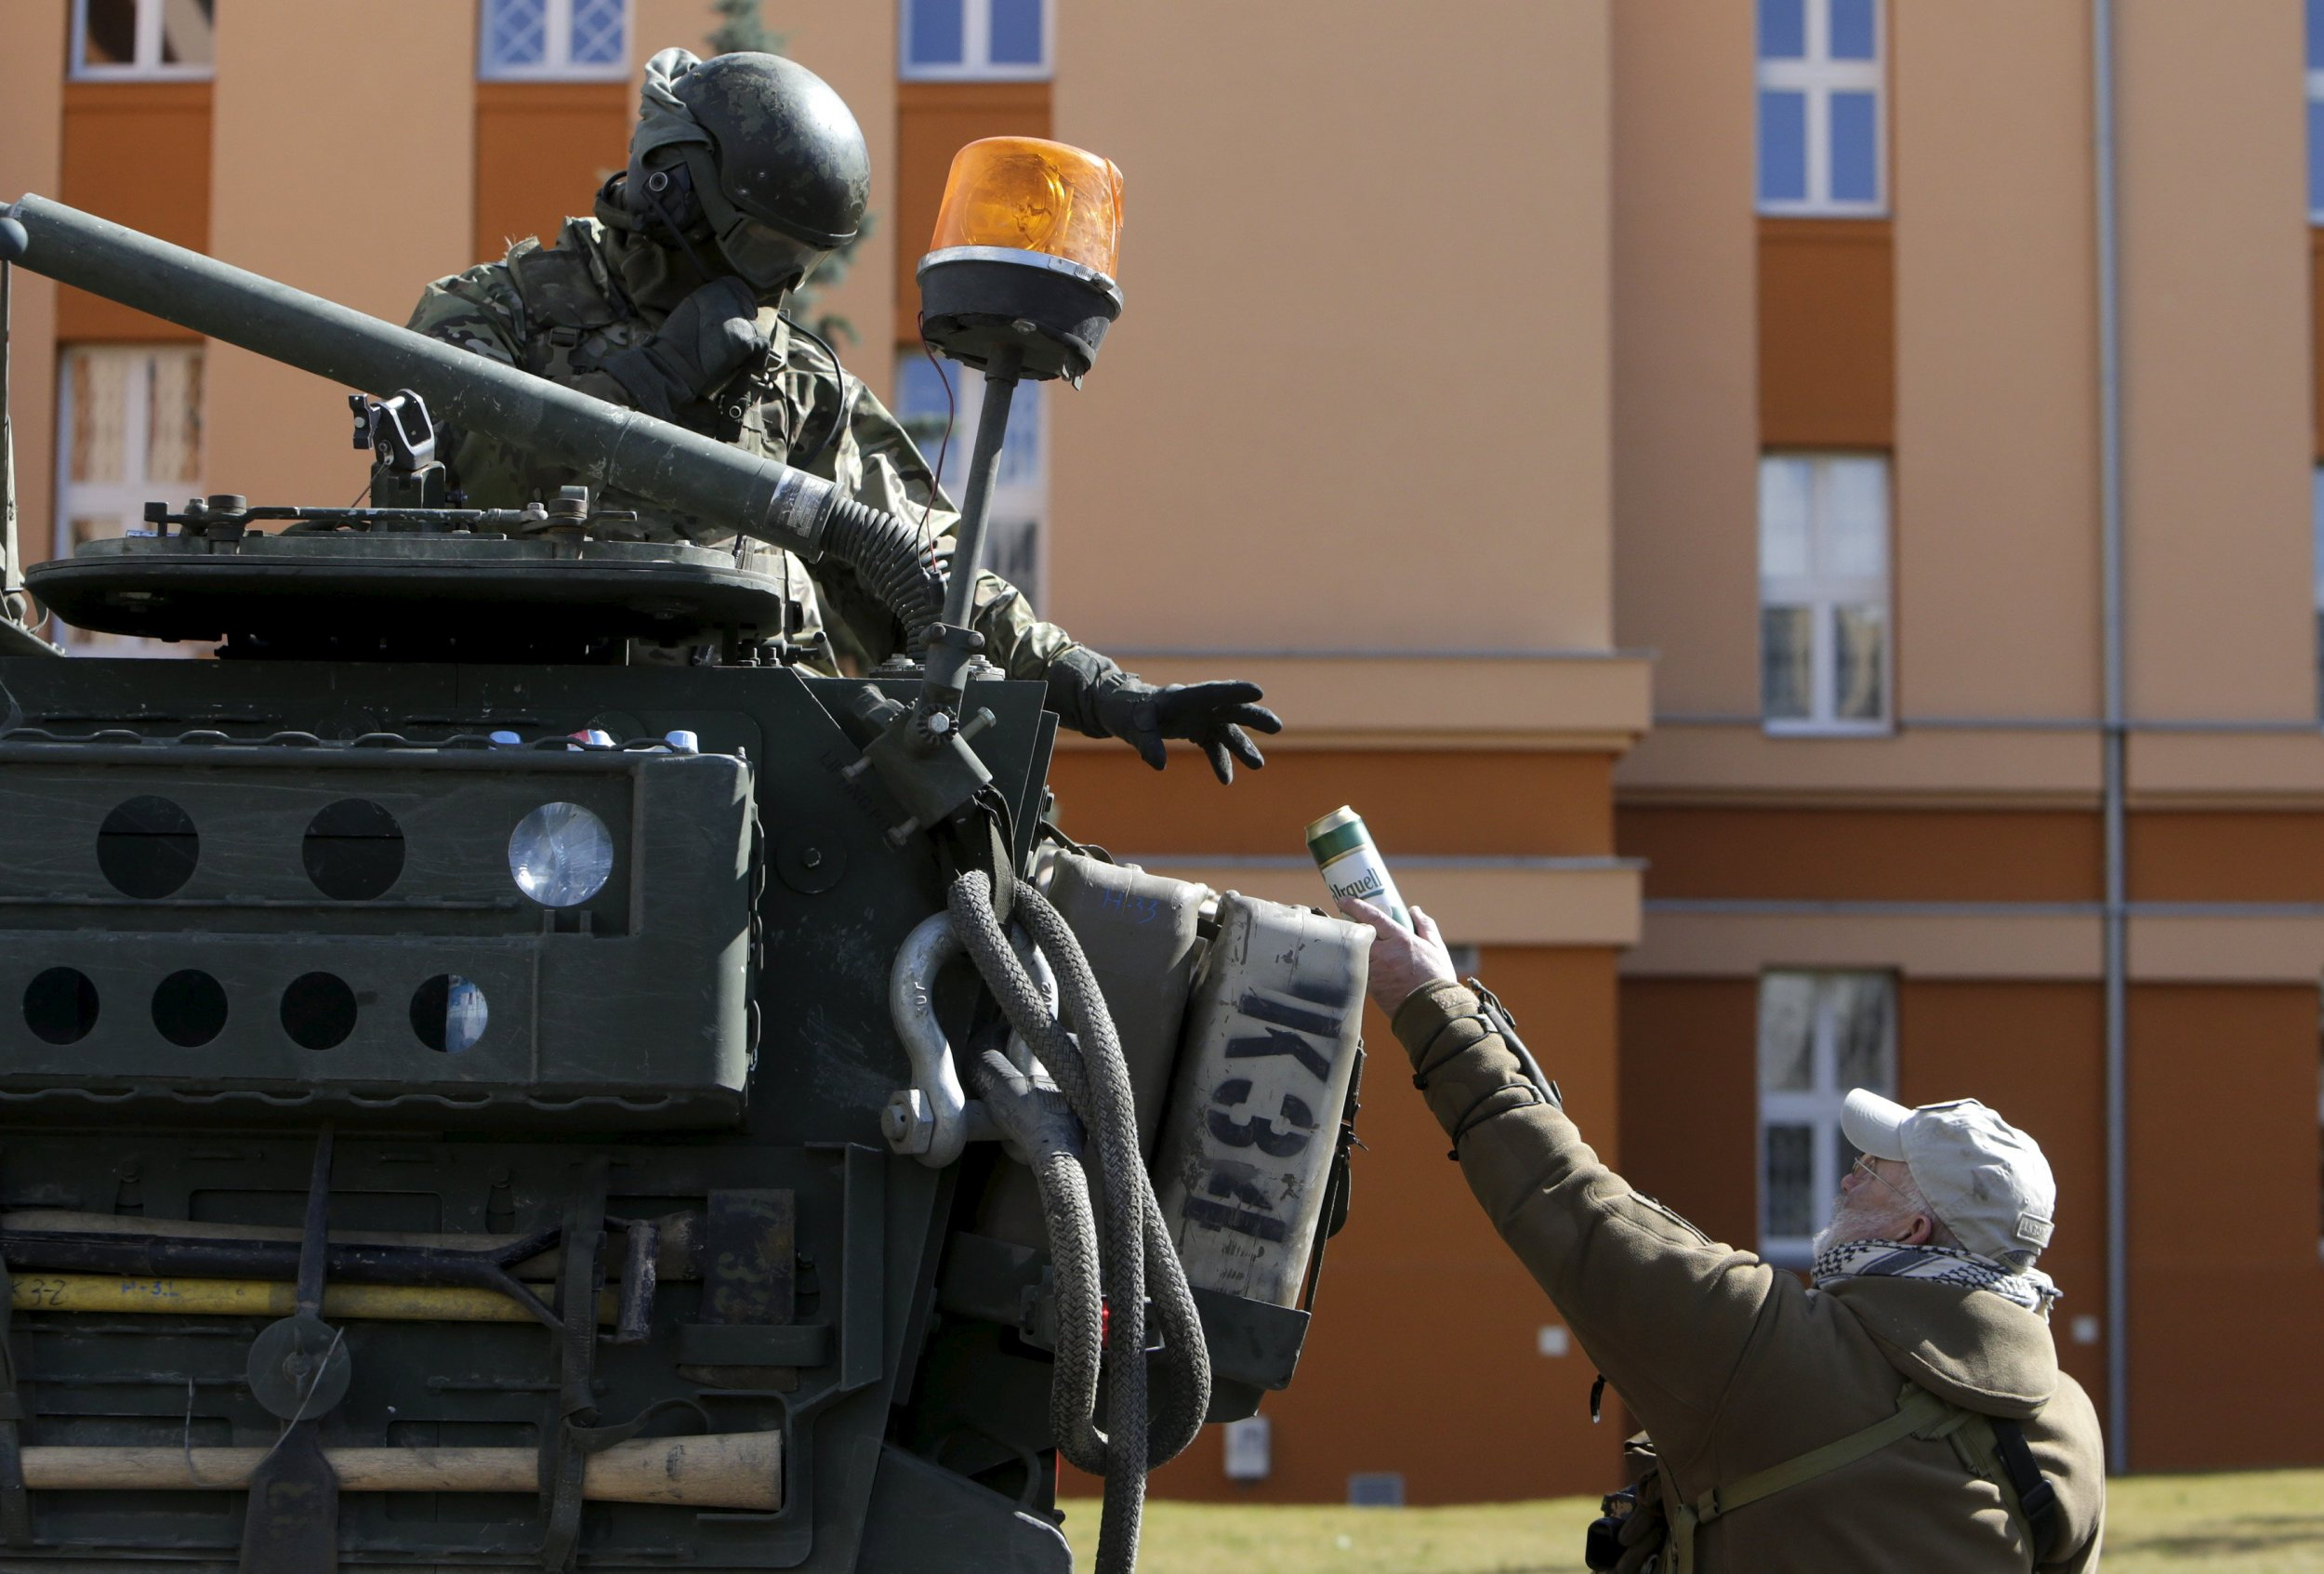 2015-03-30T135454Z_1183621897_GF10000043901_RTRMADP_3_UKRAINE-CRISIS-NATO-TRAINING